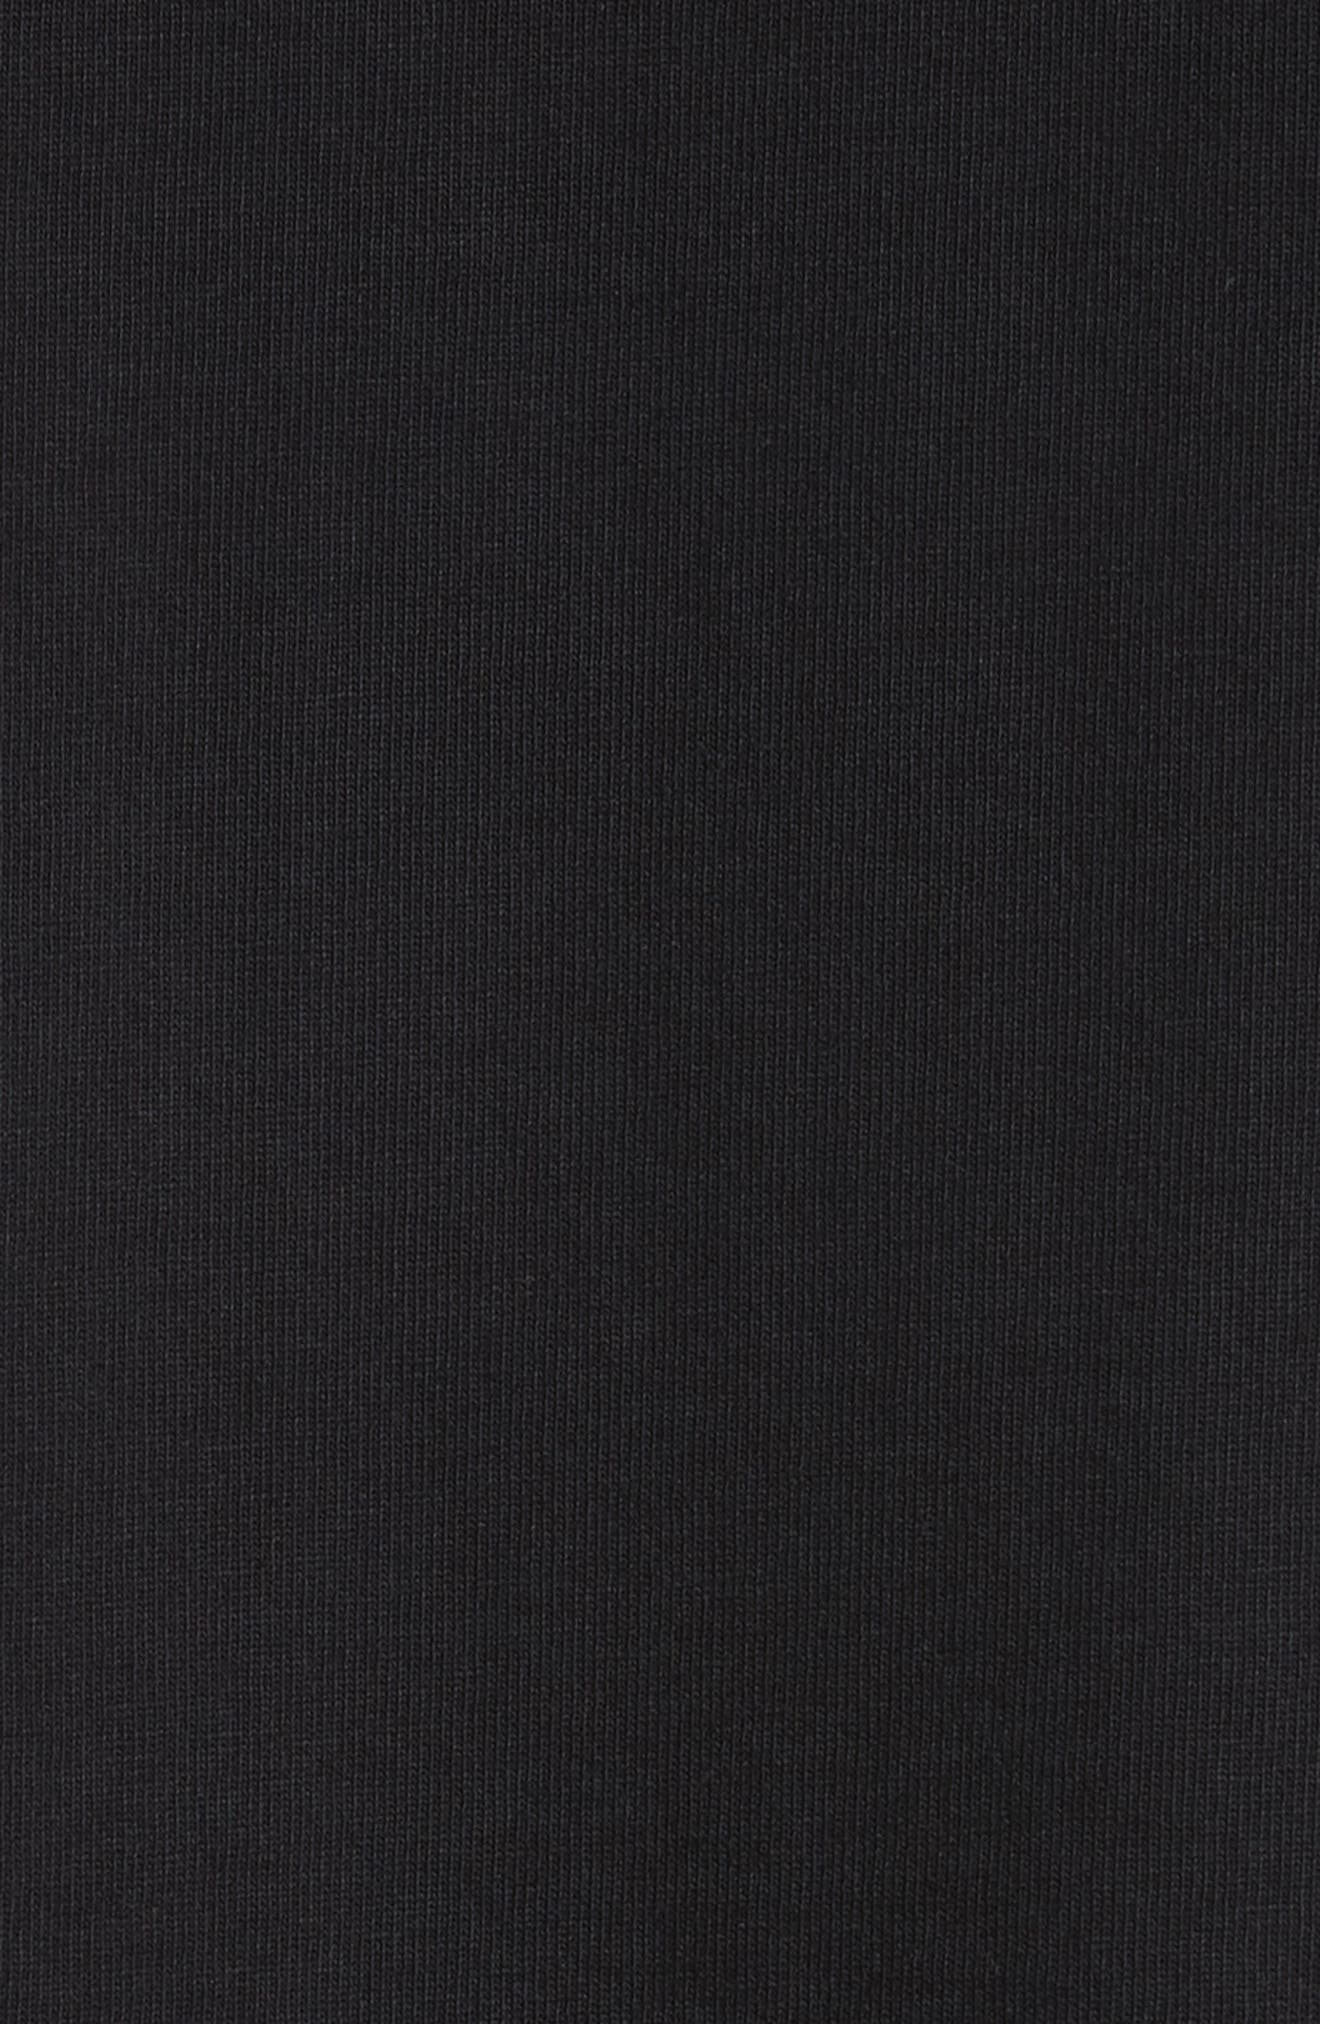 Landscape Long Sleeve T-Shirt,                             Alternate thumbnail 5, color,                             Black